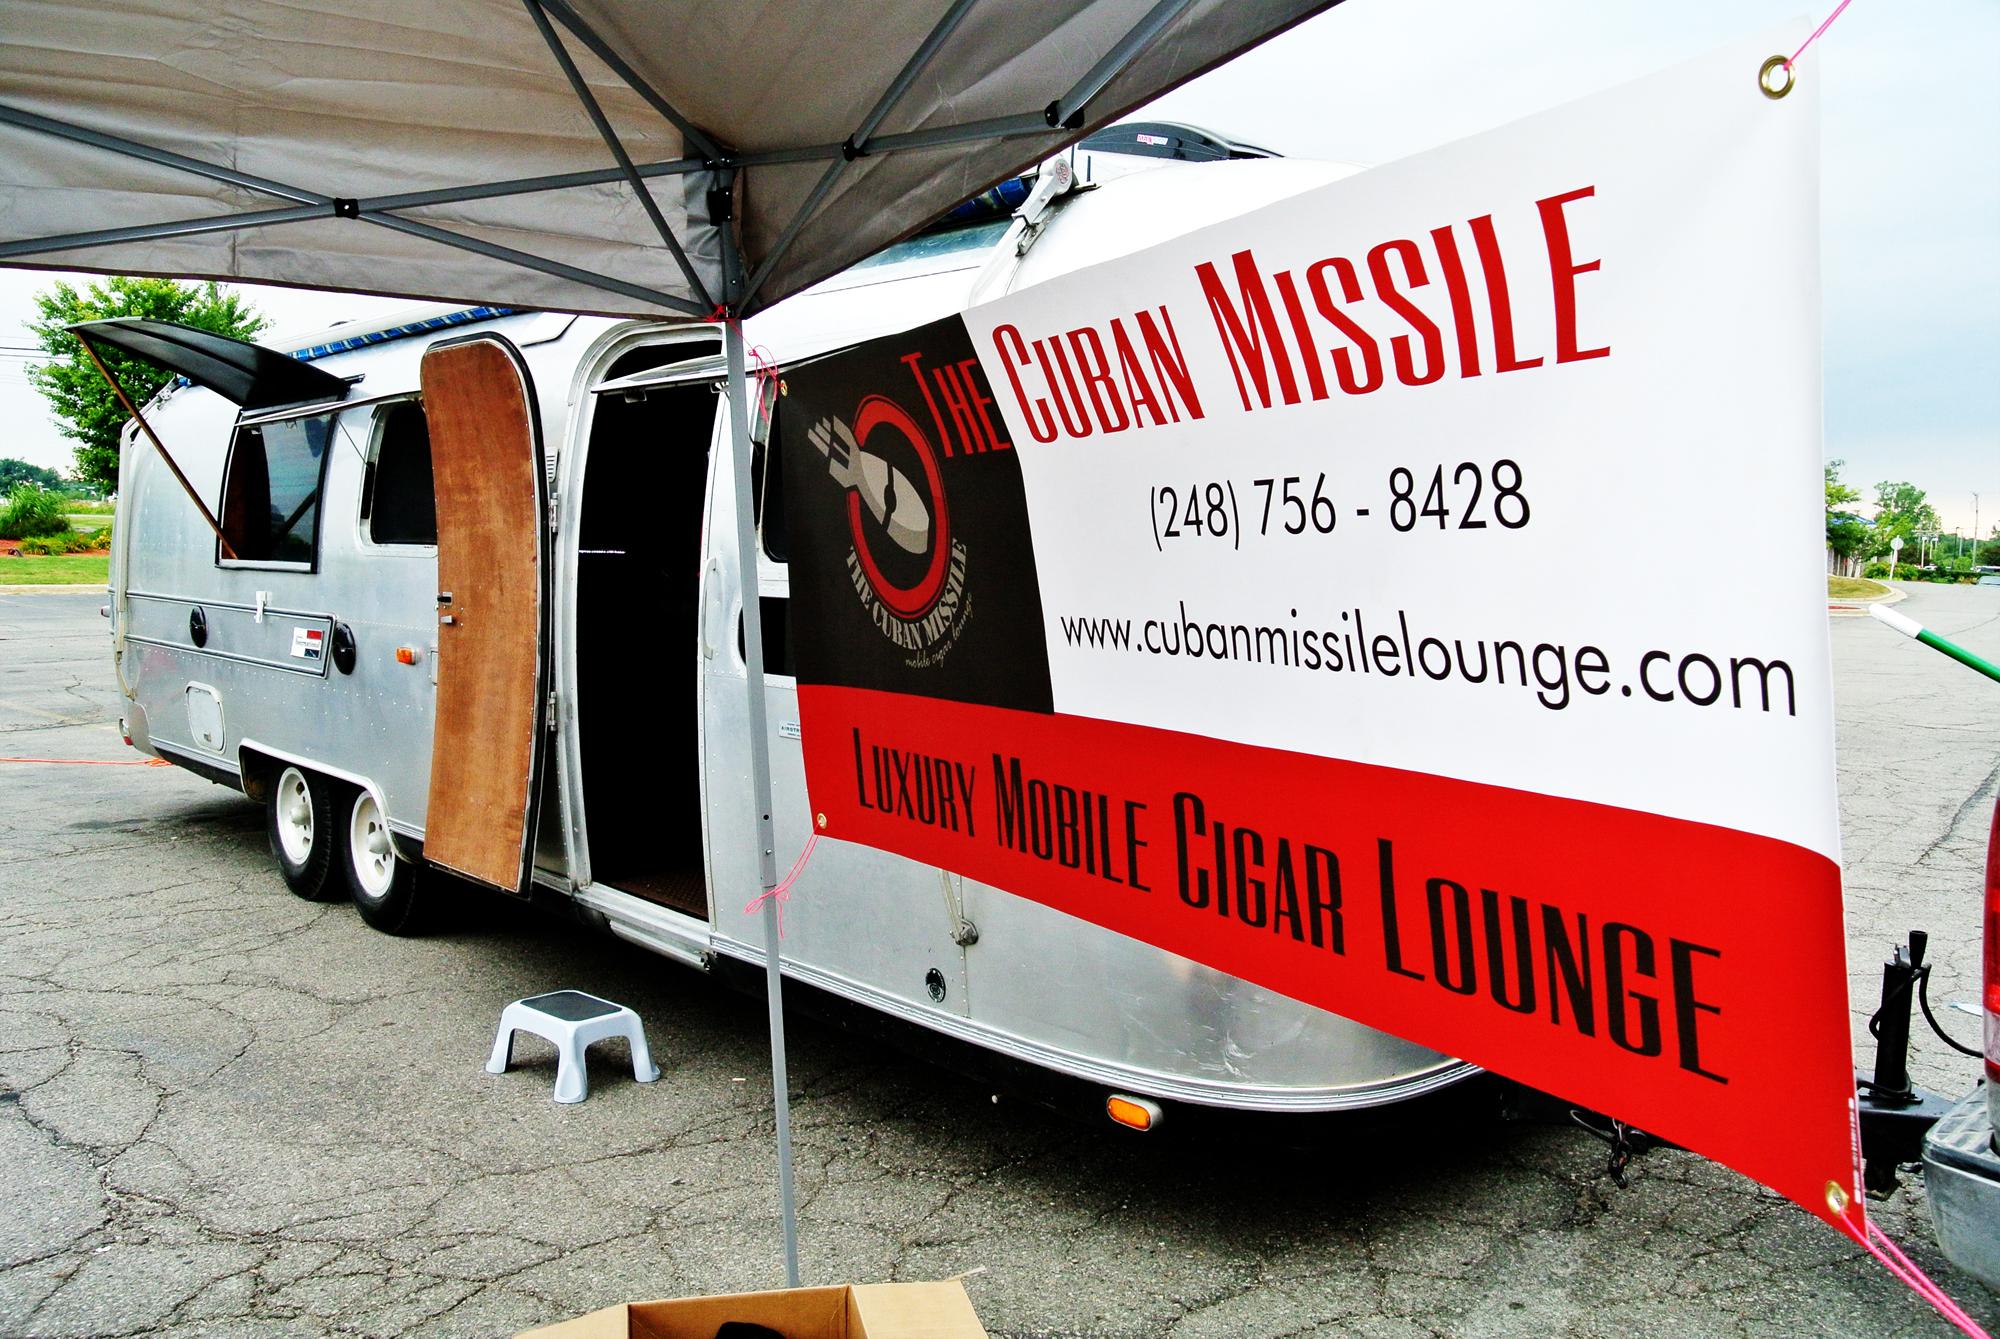 Cuban cigar bar from Airstream